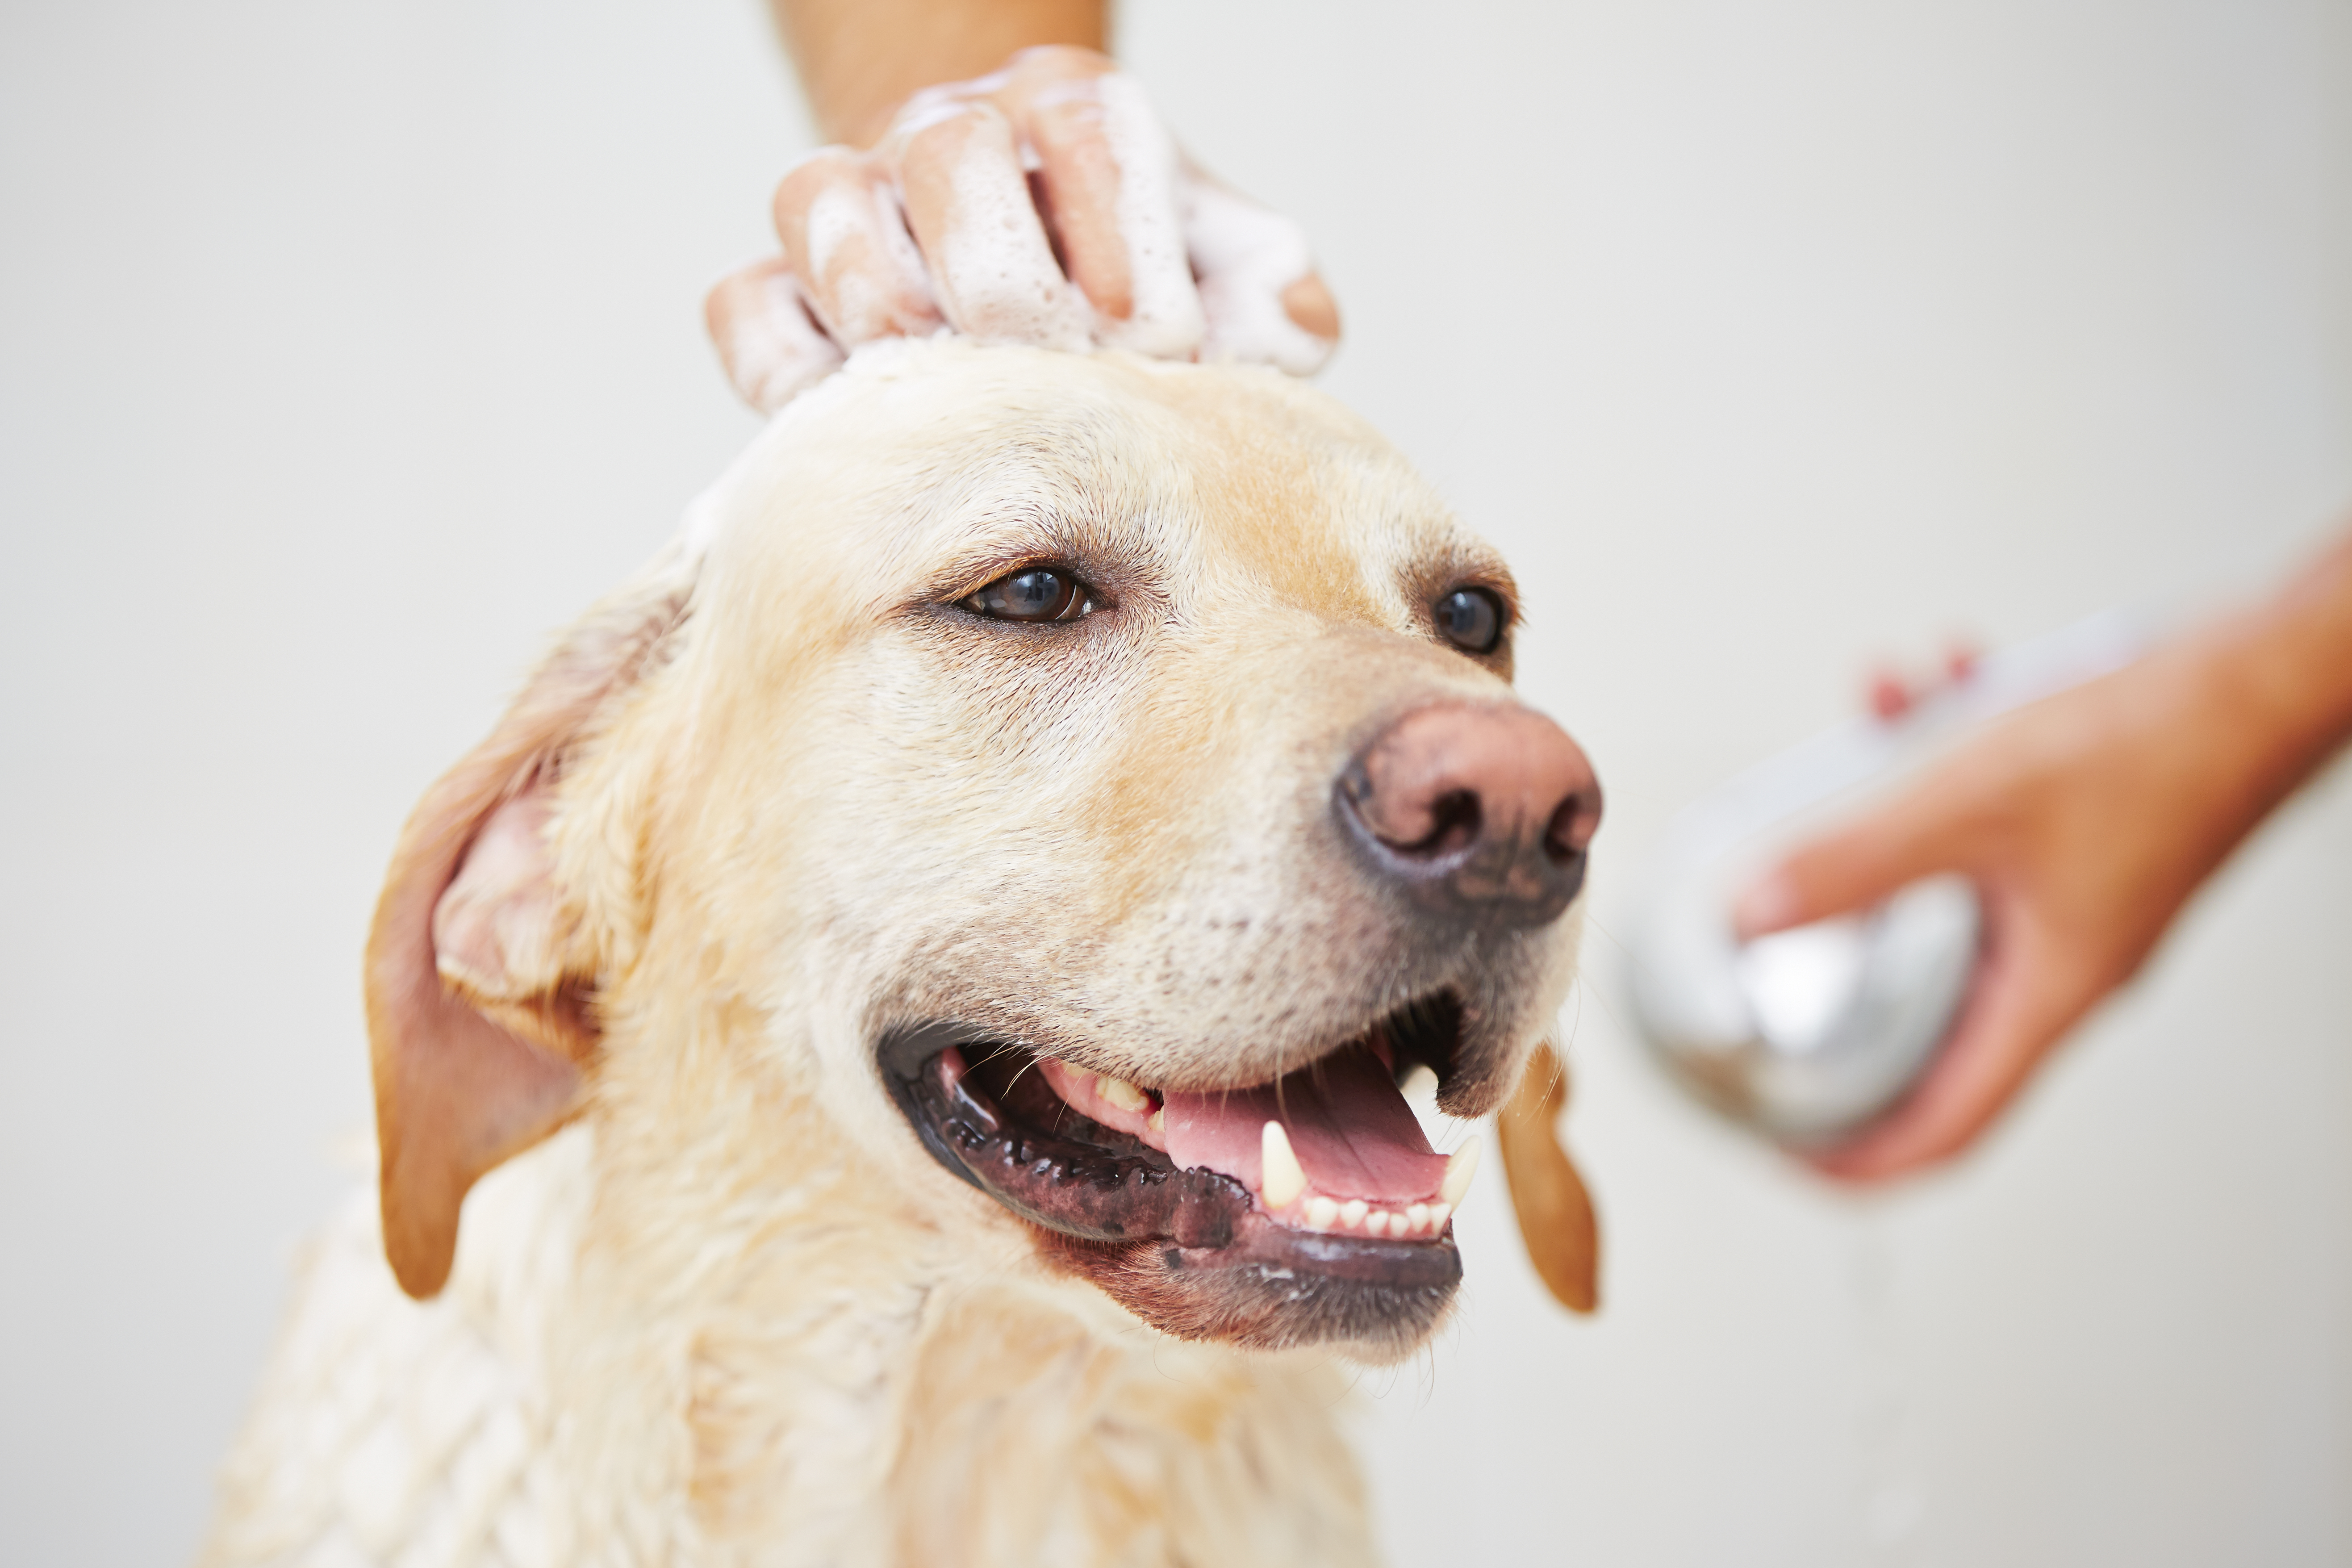 Basic Dog Grooming Tips